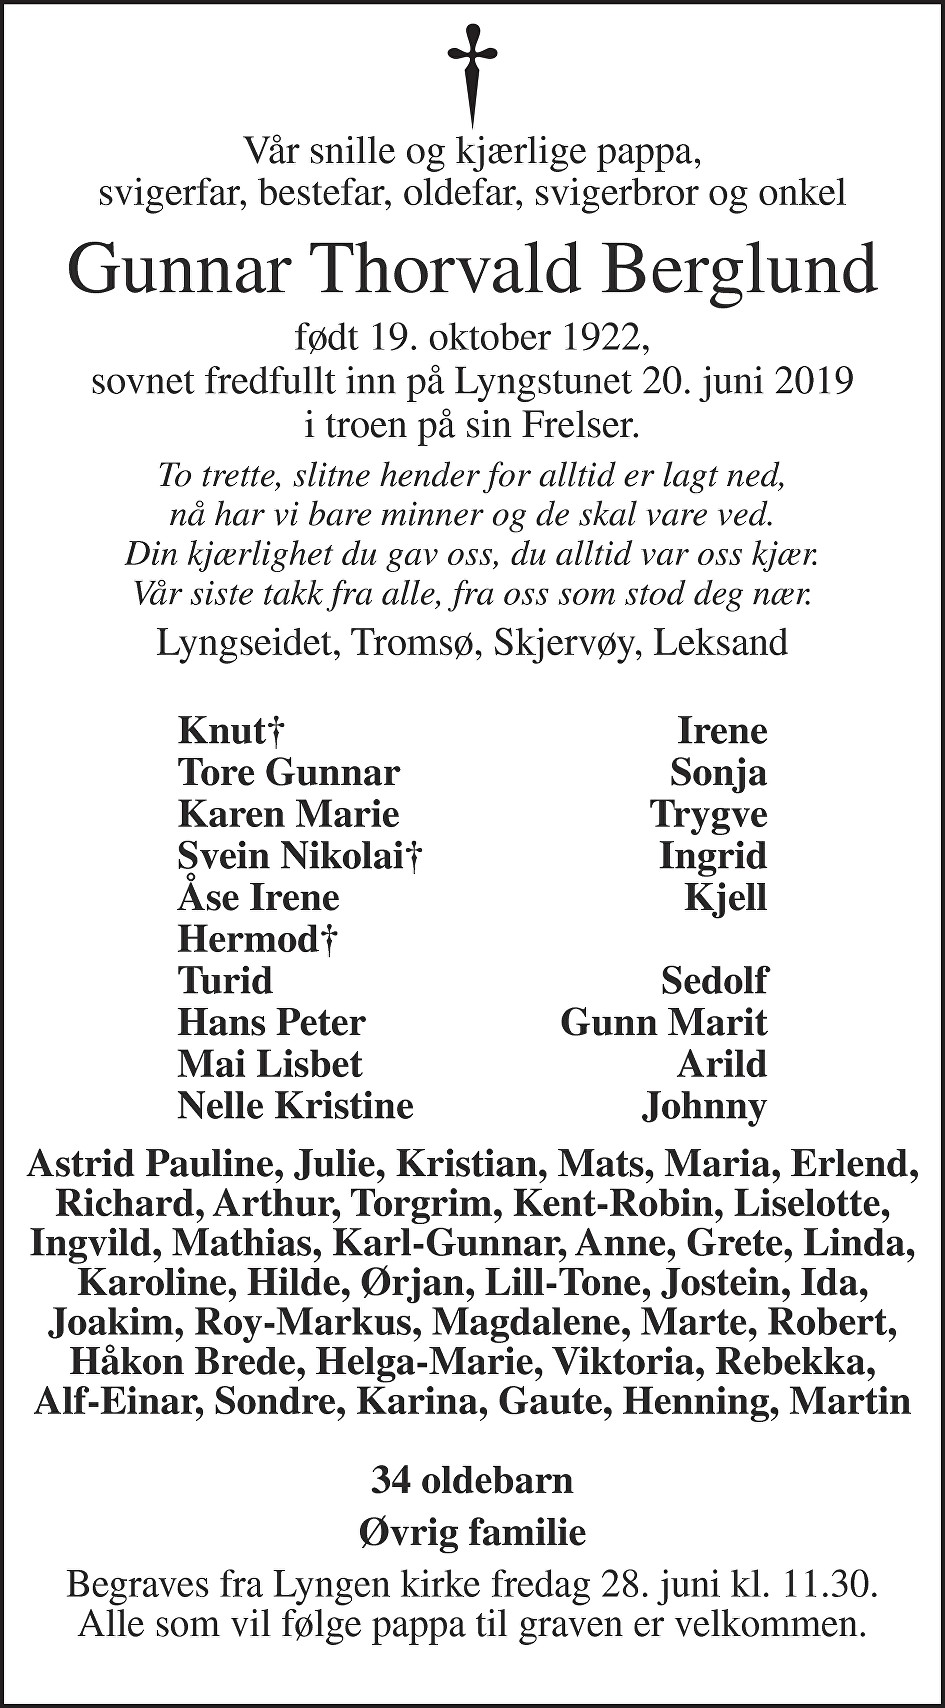 Gunnar Thorvald Berglund Dødsannonse